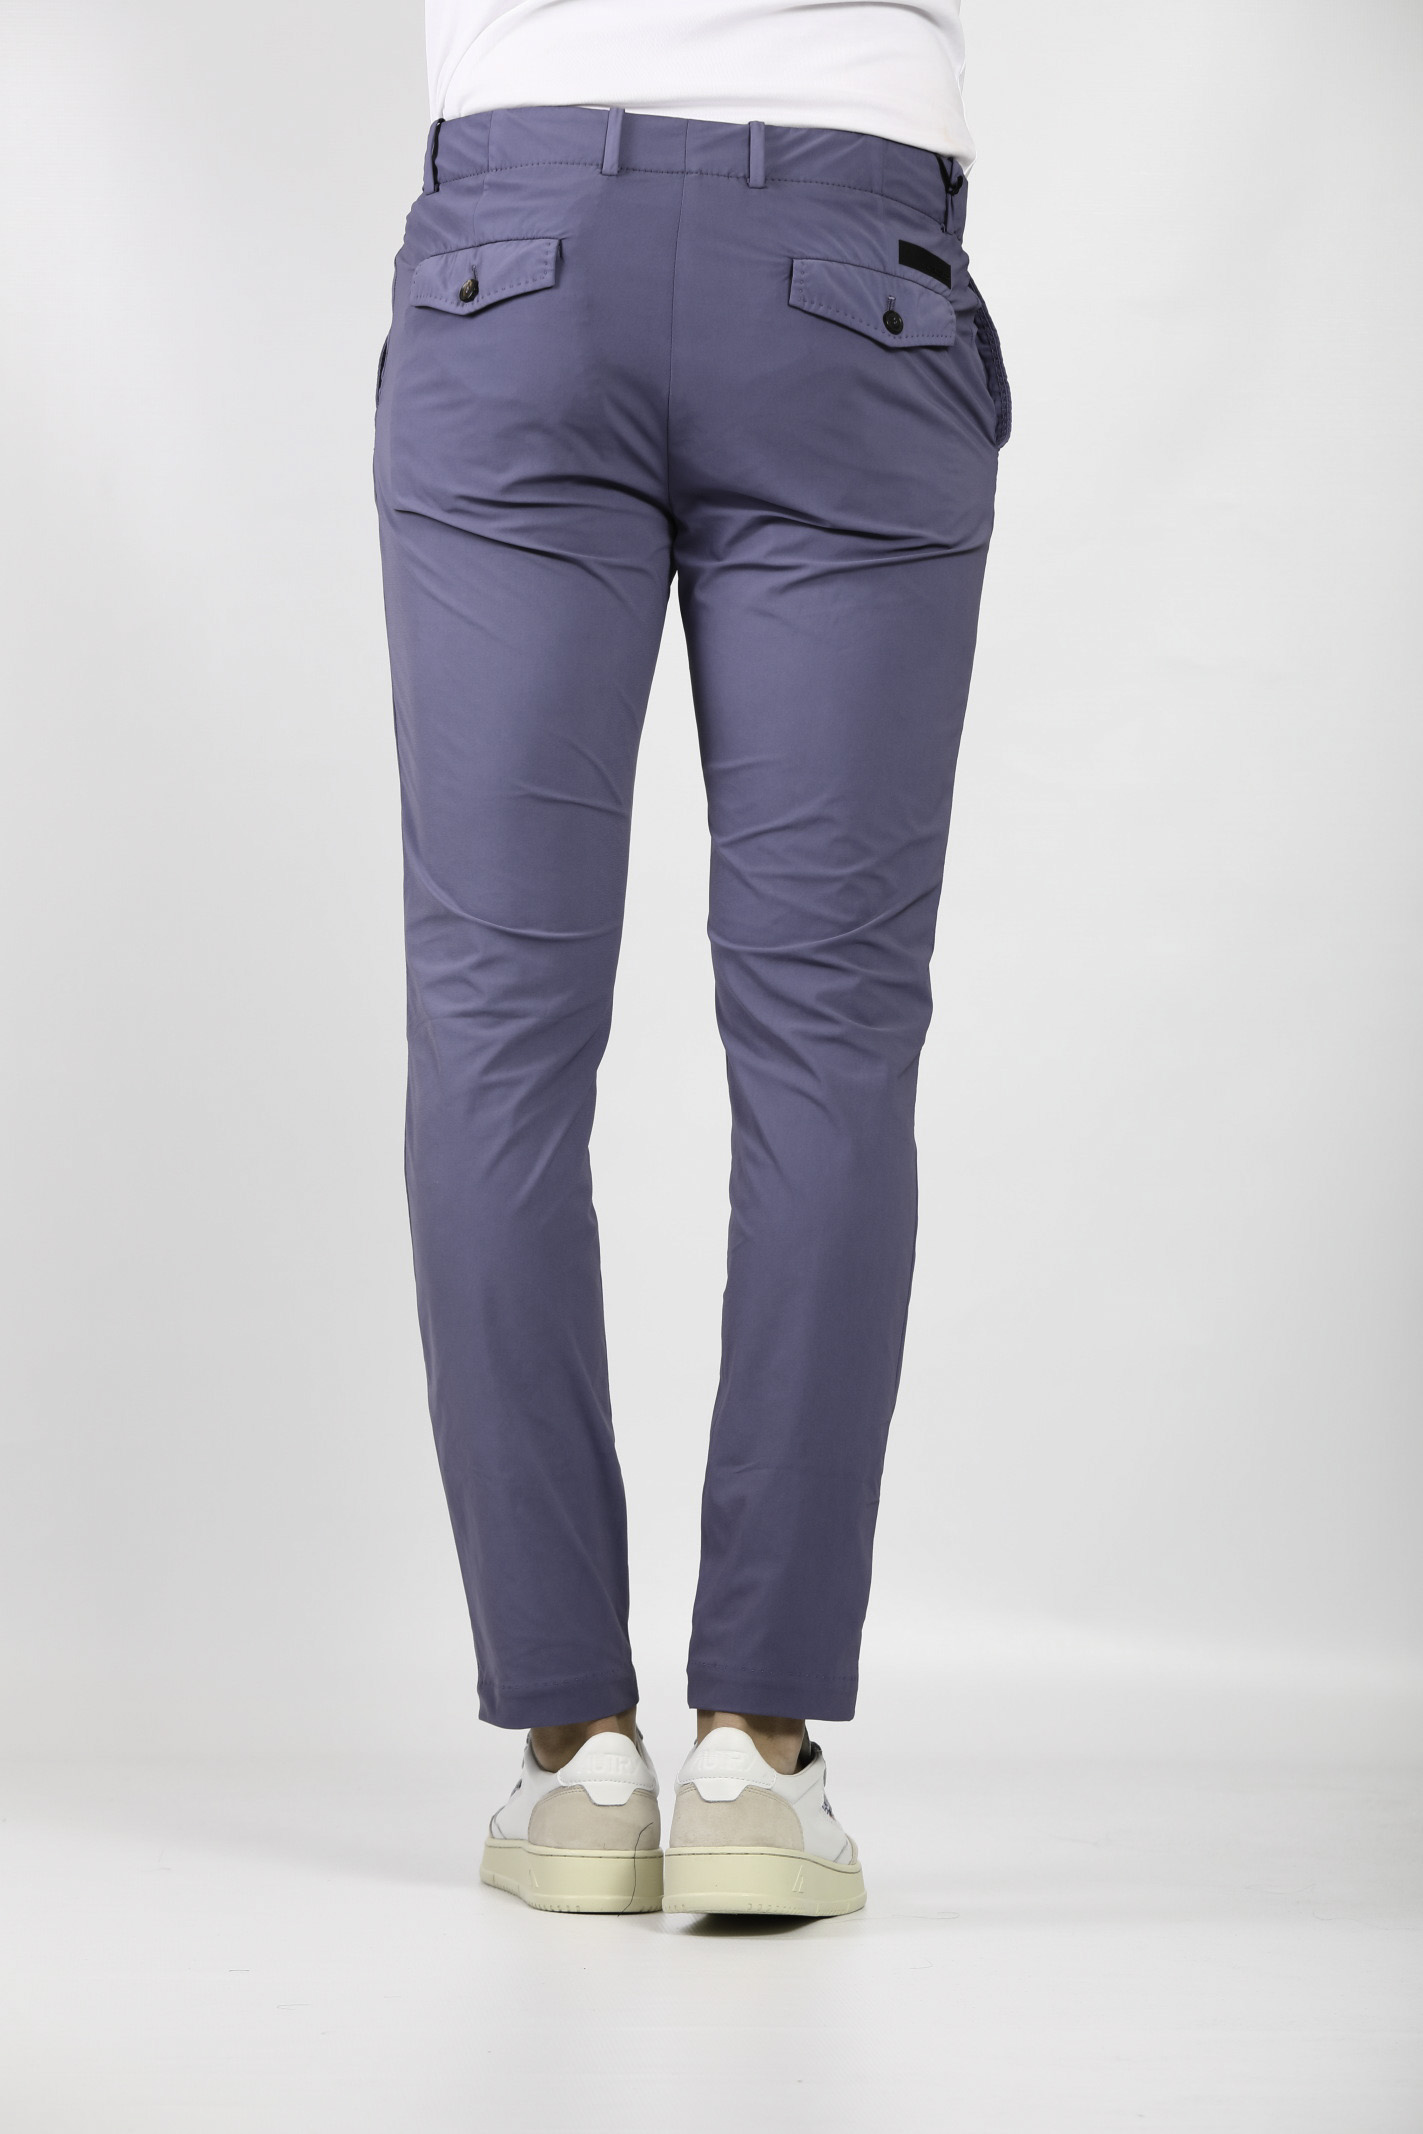 PANTS RRD | Pants | 2122764